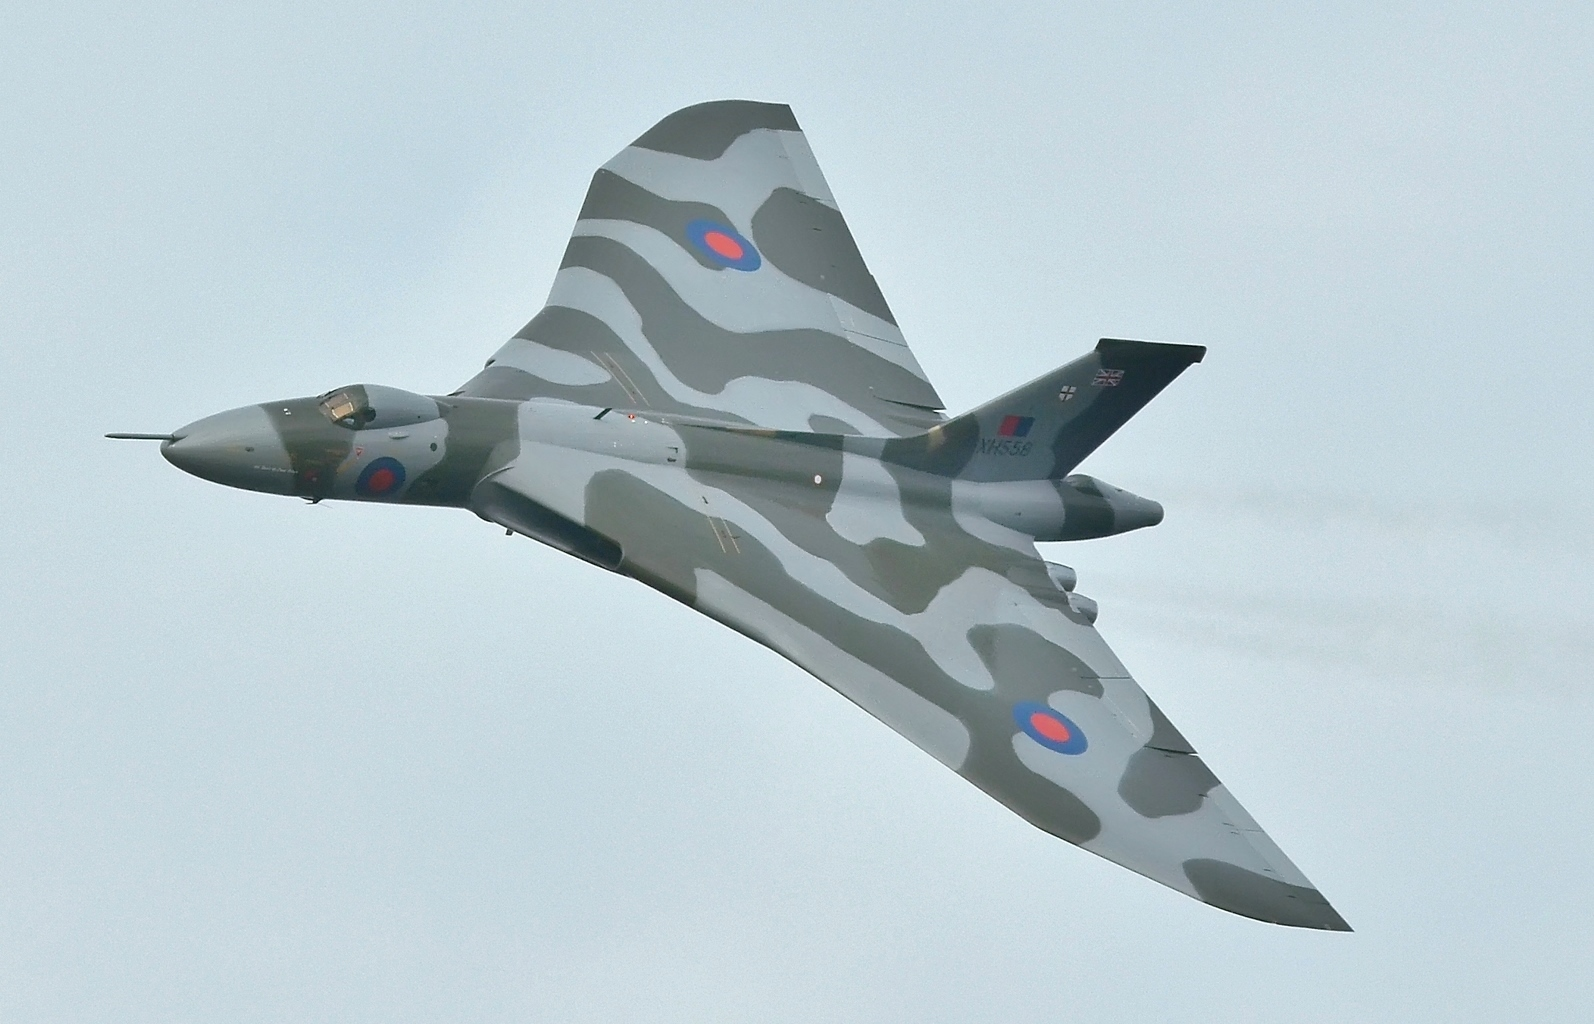 https://upload.wikimedia.org/wikipedia/commons/0/05/XH558_%28G-VLCN%29_Avro_Vulcan_-_Last_Flight_over_Farnborough_%28cropped%29.jpg